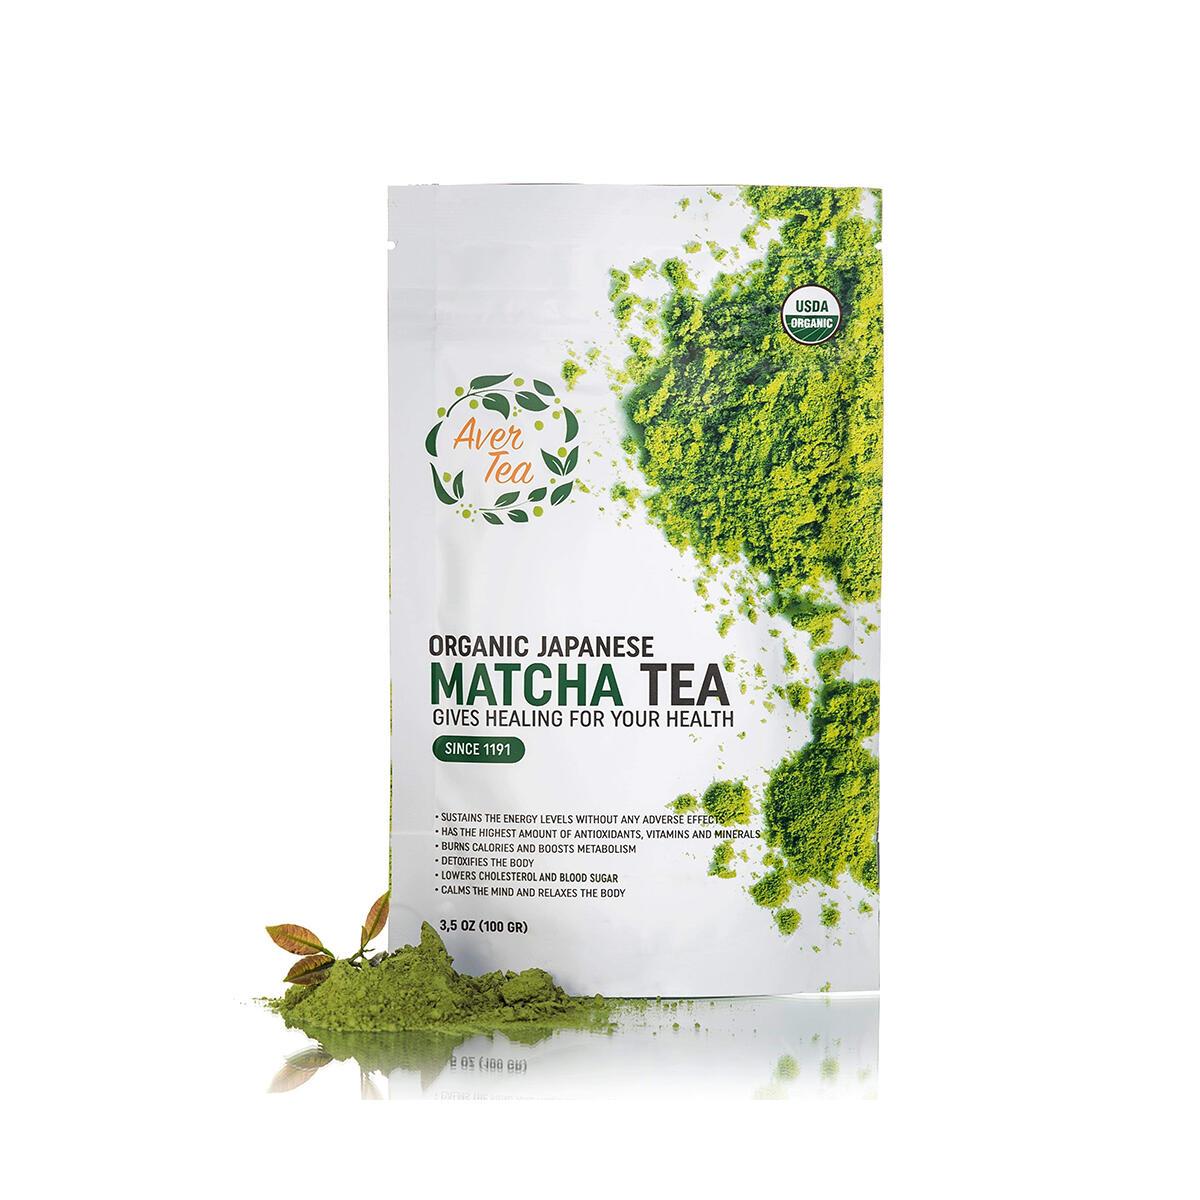 Organic Matcha Green Tea Powder - Classic Japanese Natural Tea Grade - USDA & Vegan Certified Made From 100 Percent Organic Tea Leaves - Antioxidants, Energy, Detox, Smoothies - 3,5 oz by Aver Tea